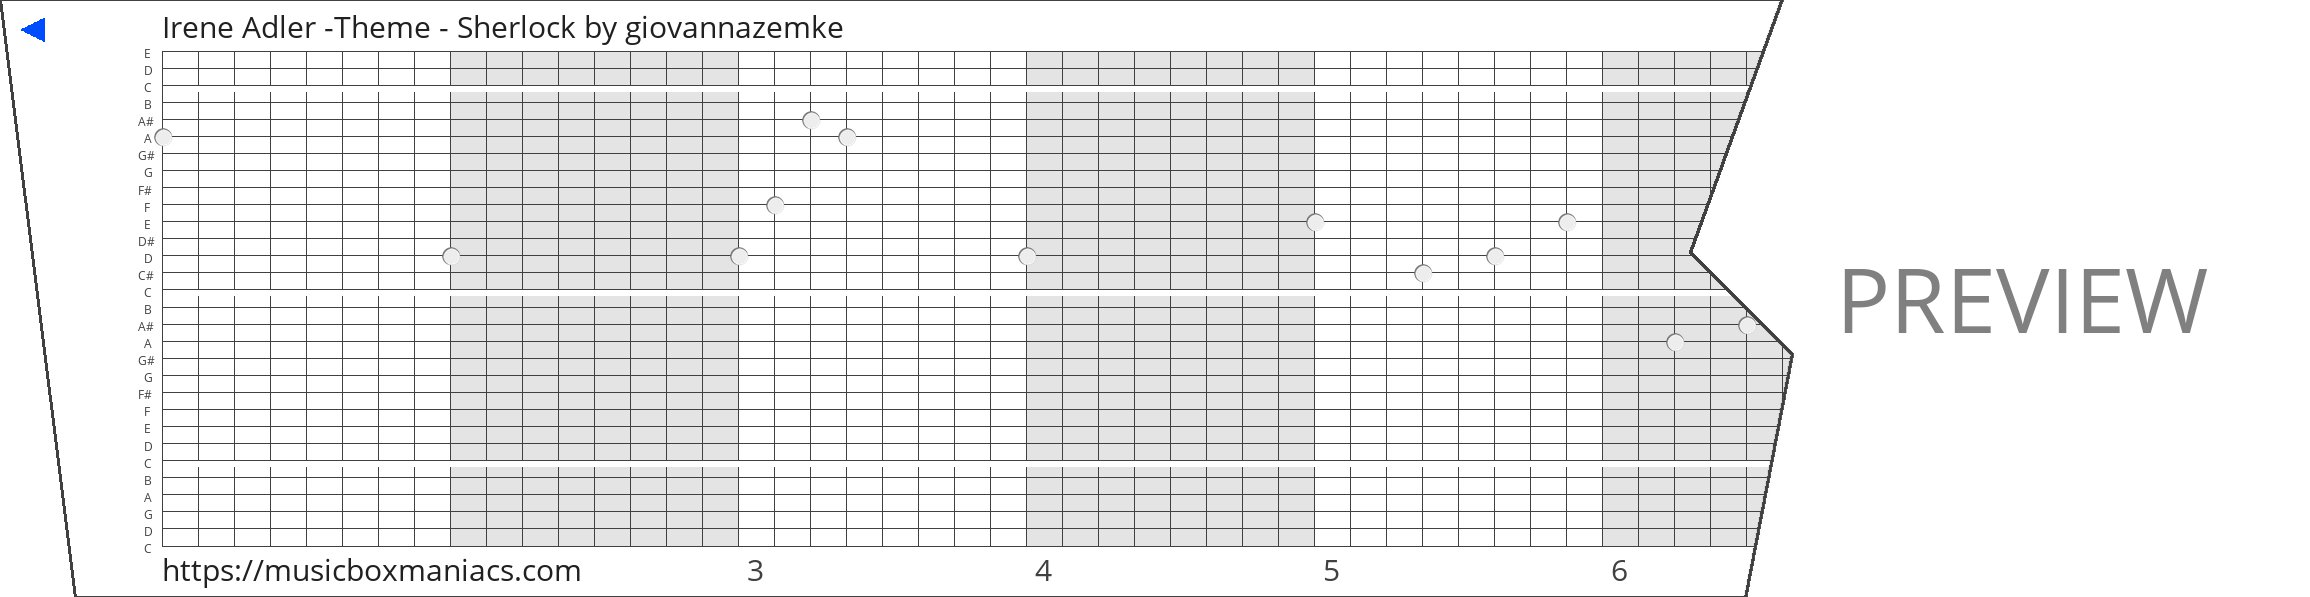 Irene Adler -Theme - Sherlock 30 note music box paper strip